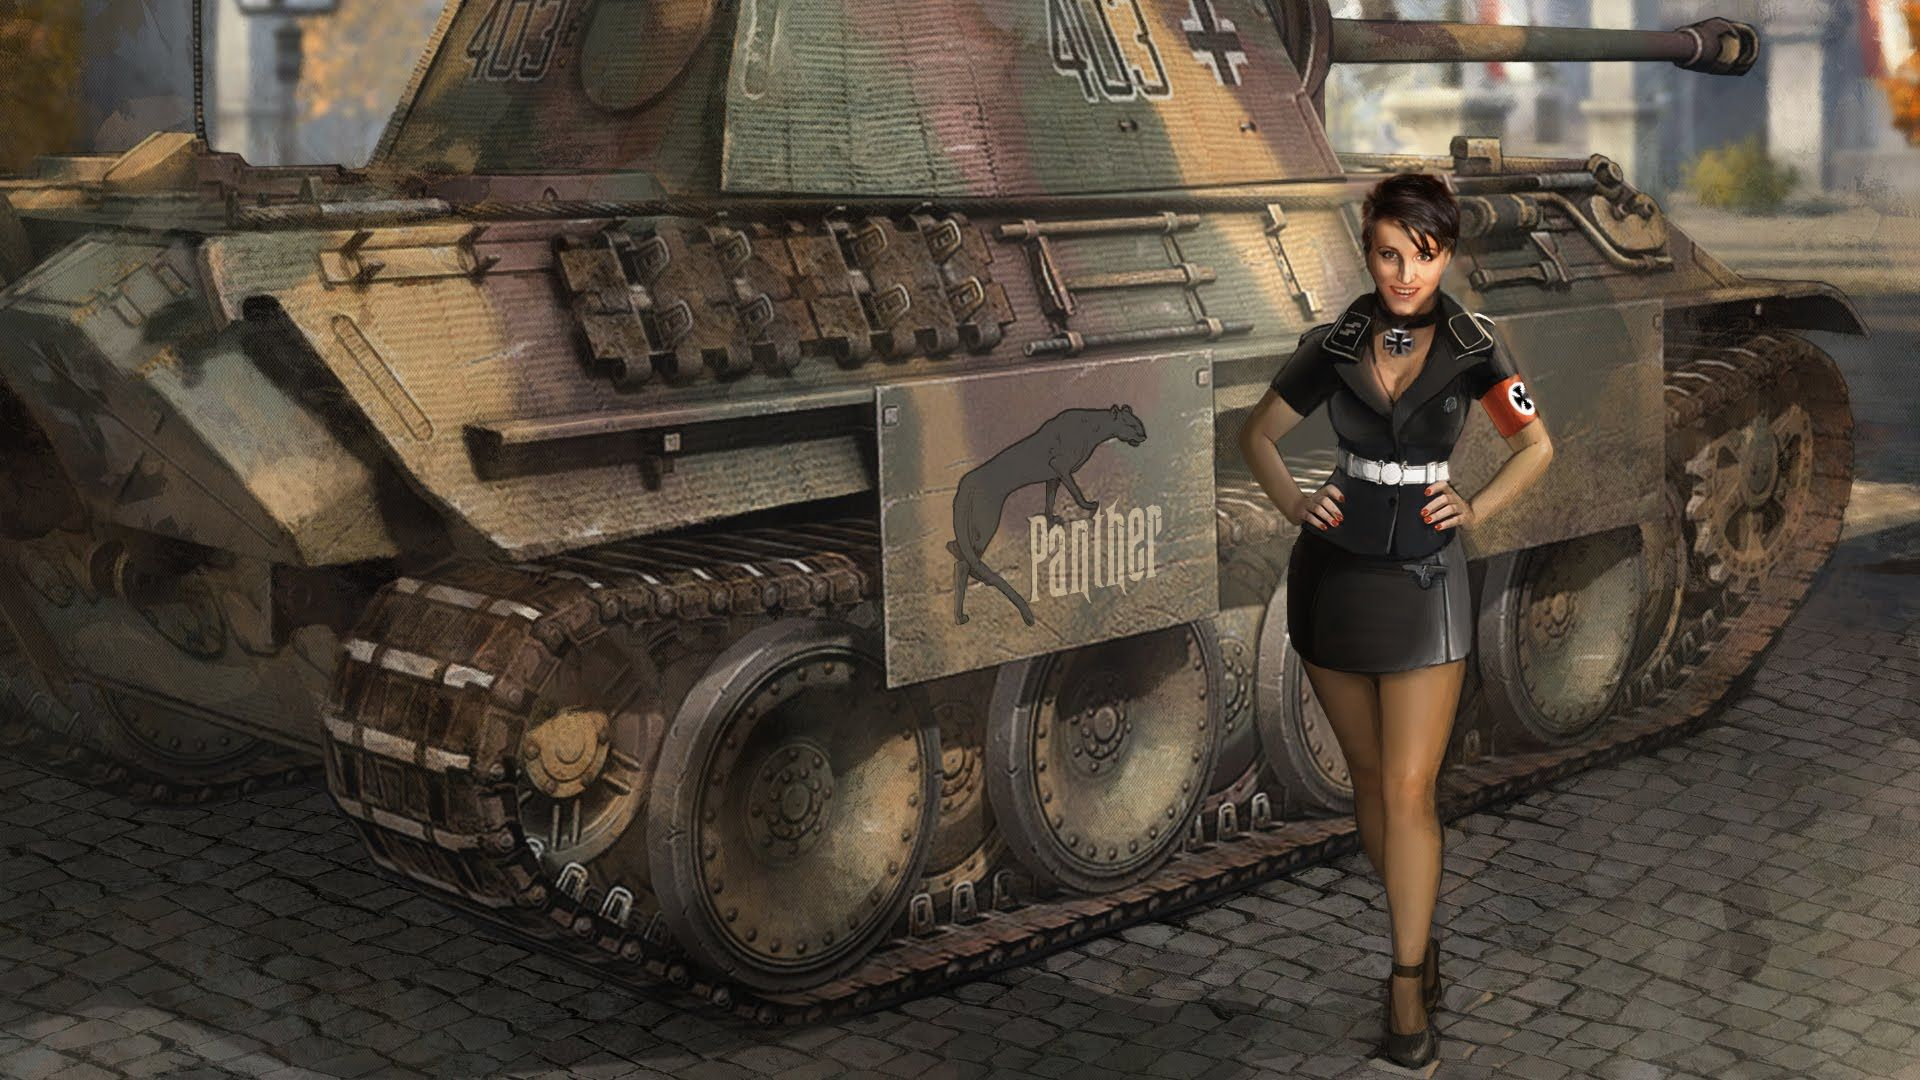 Wot Live Suli Elotti Roham Tank Wallpaper World Of